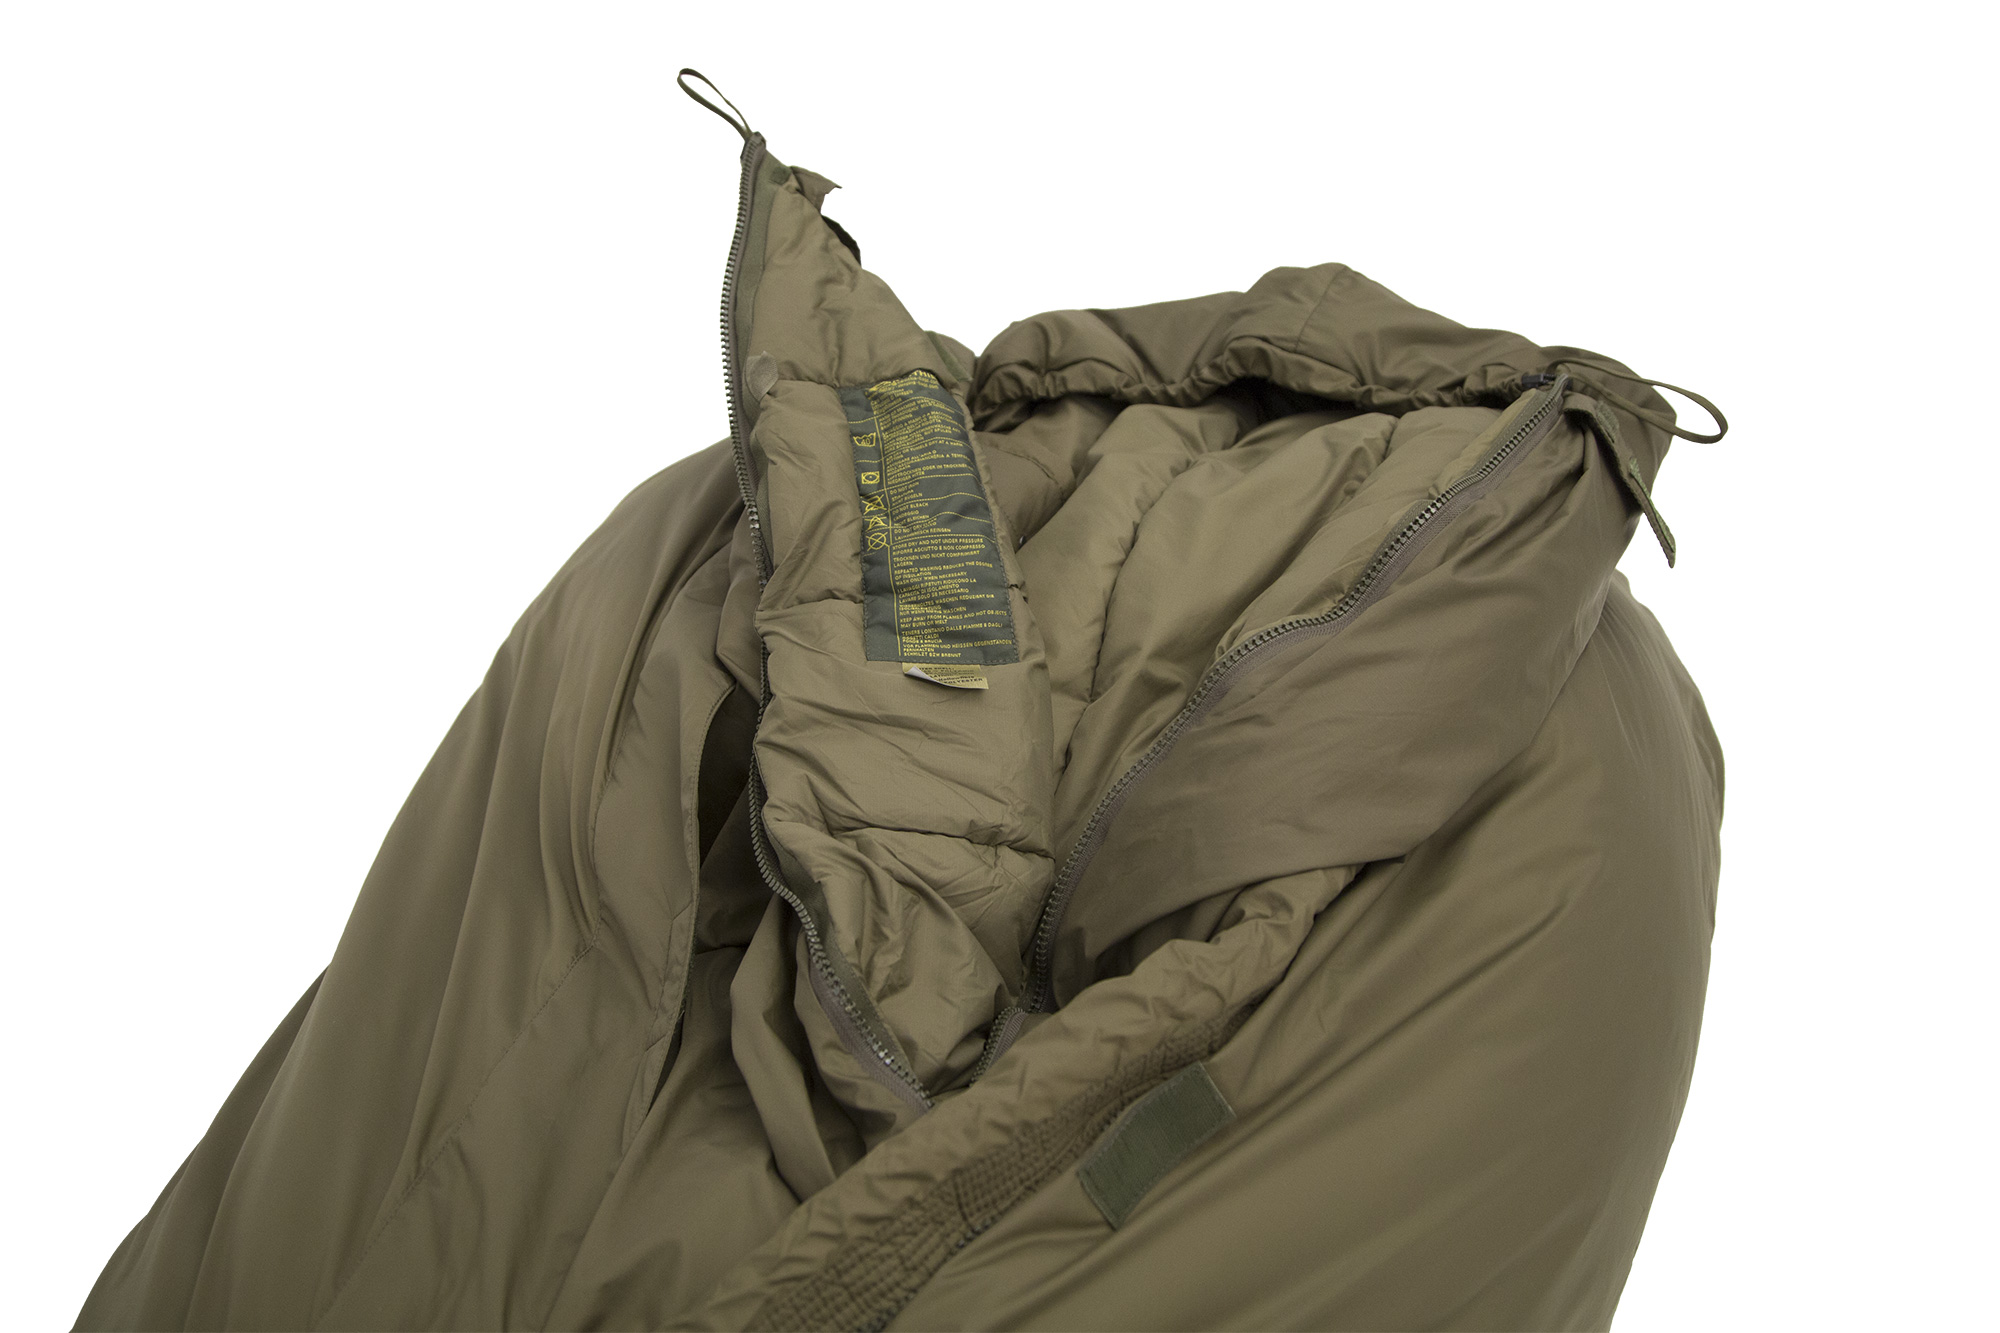 SLEEPING BAG SYSTEM – Carinthia